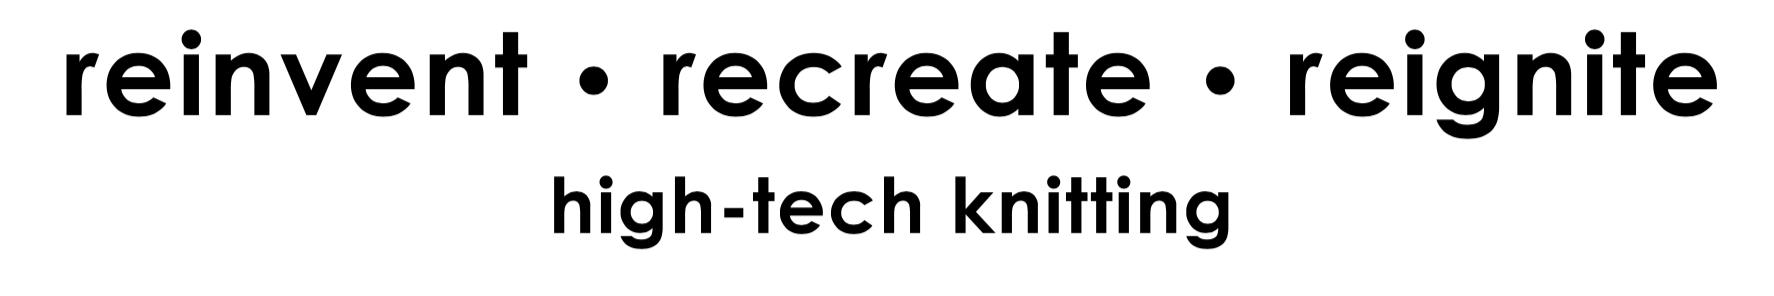 Reinvent Recreate Reignite High-Tech Knitting